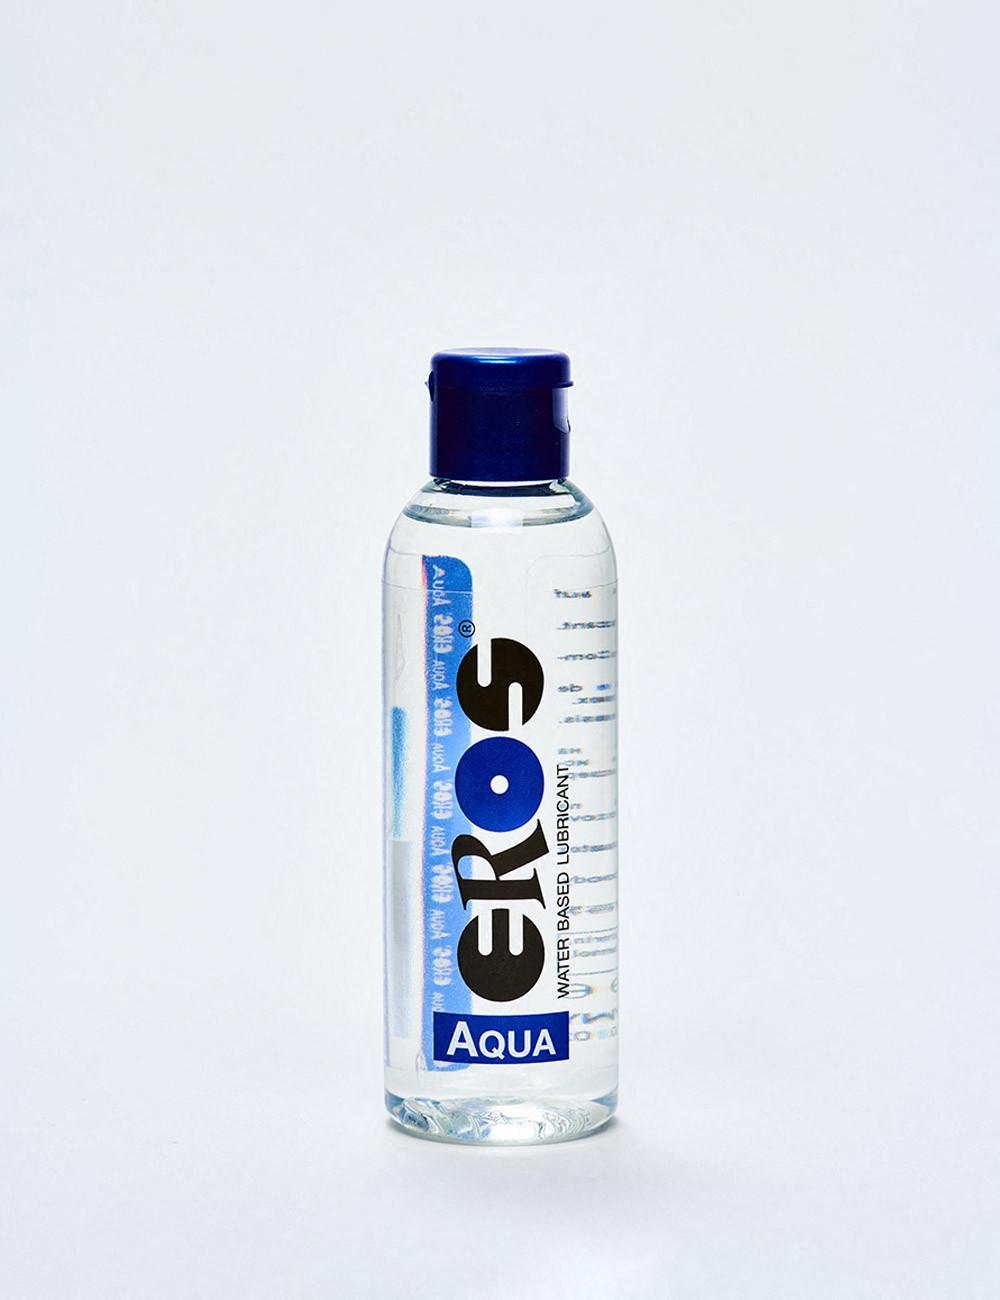 Lubricante Eros Water 100ml